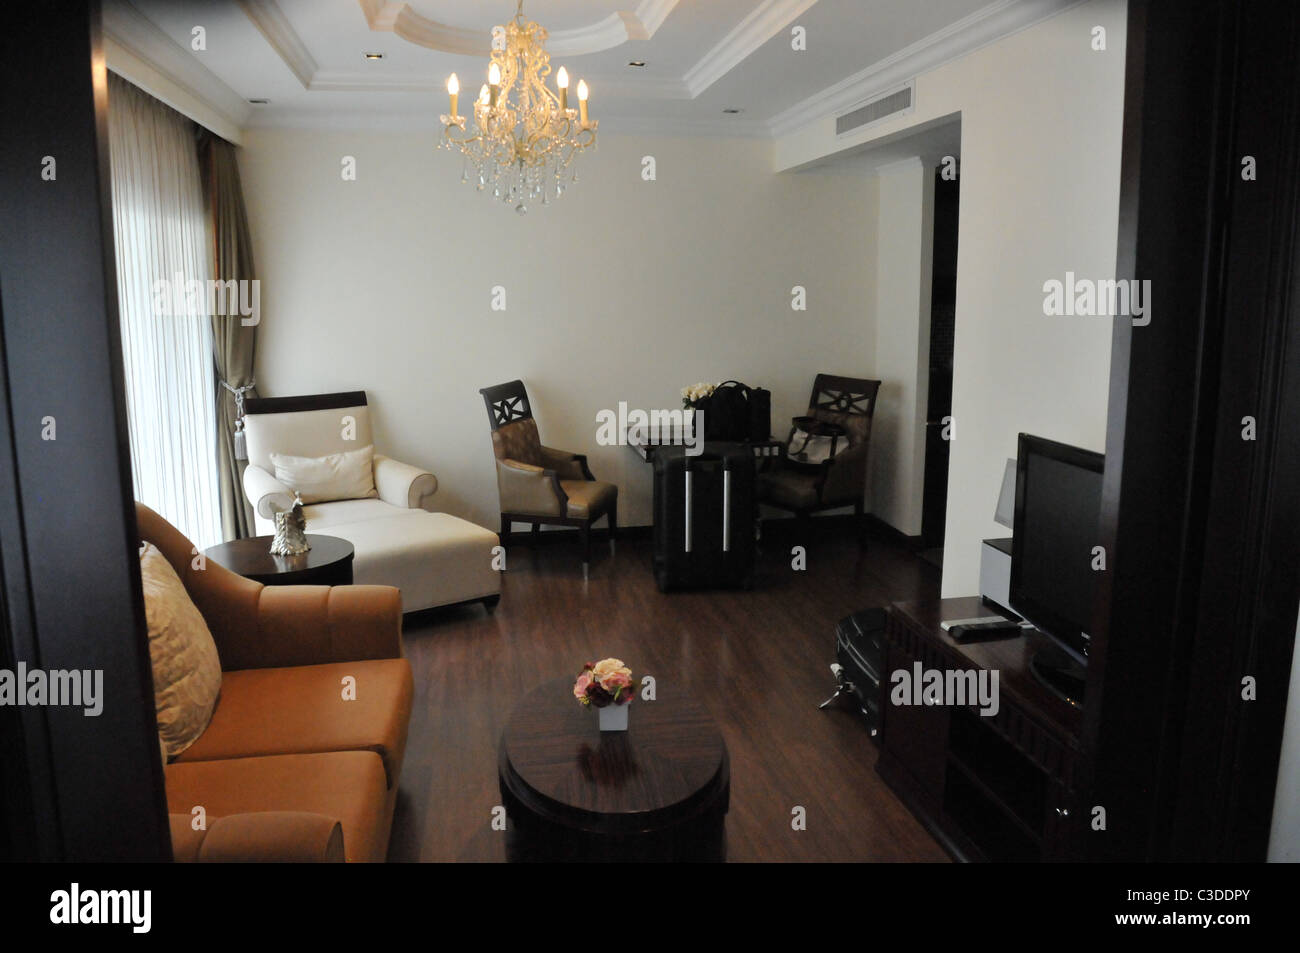 Pattaya Lk Renaissance Hotel Stock Photo 36560915 Alamy